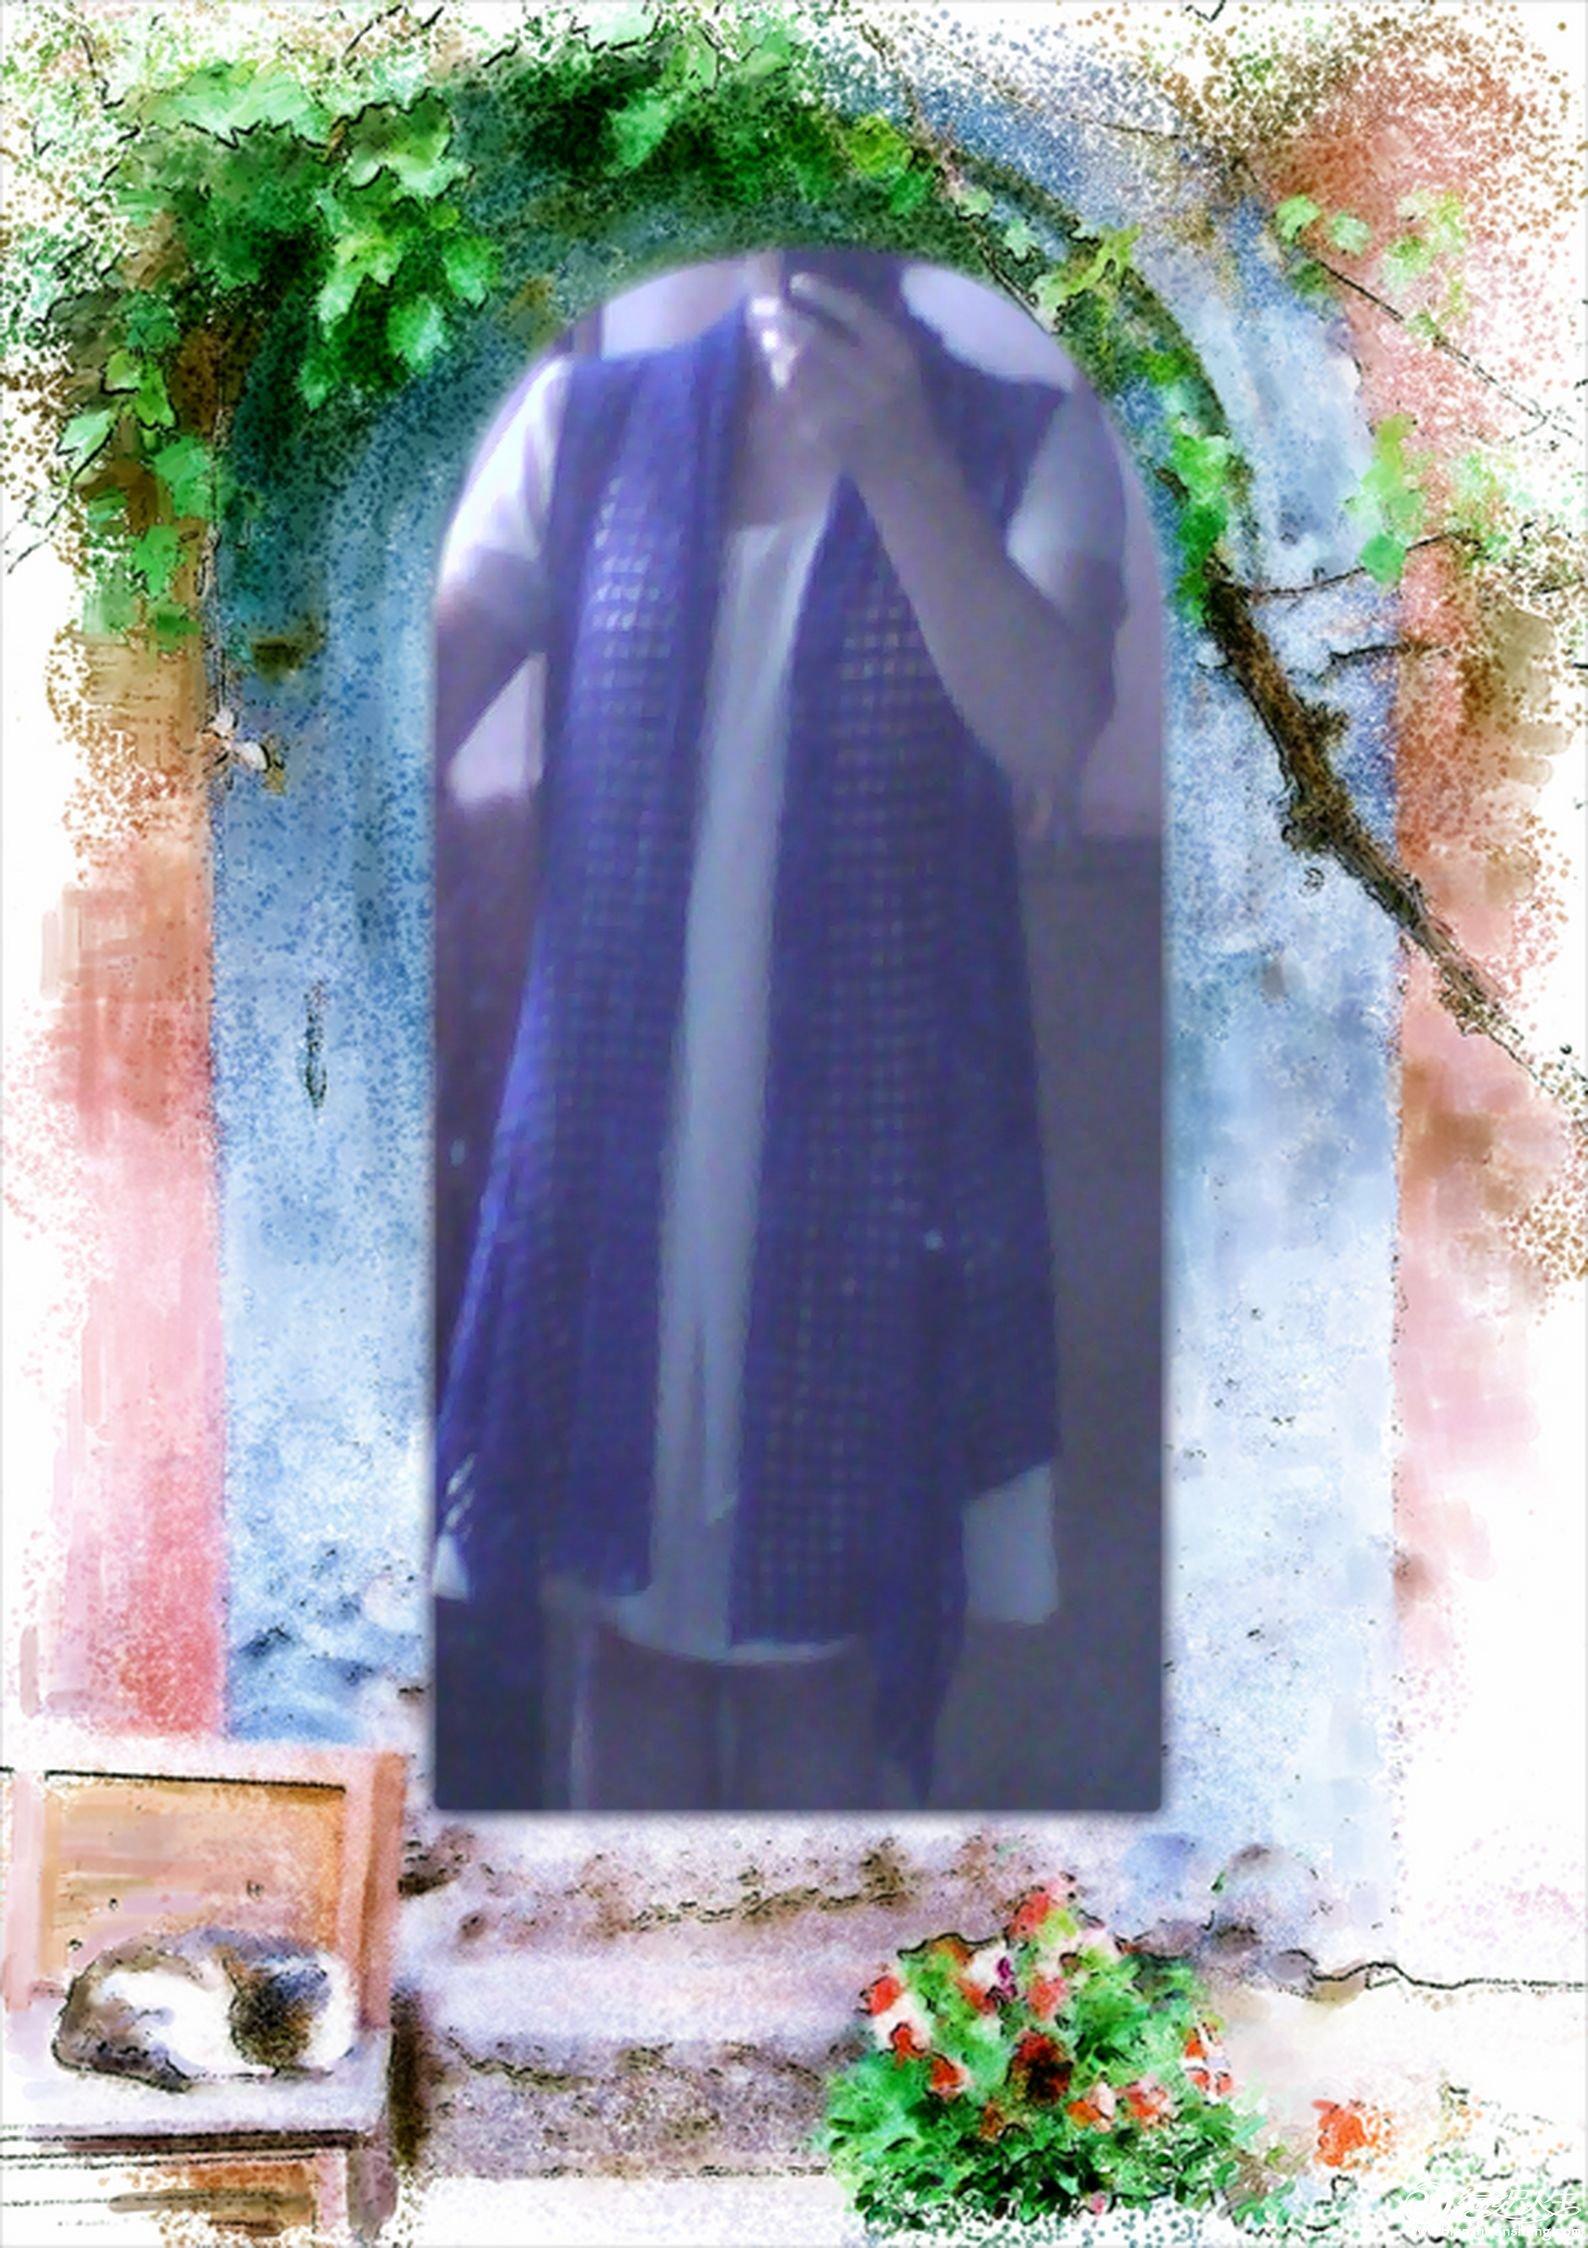 IMG_20120604_081335_02.jpg